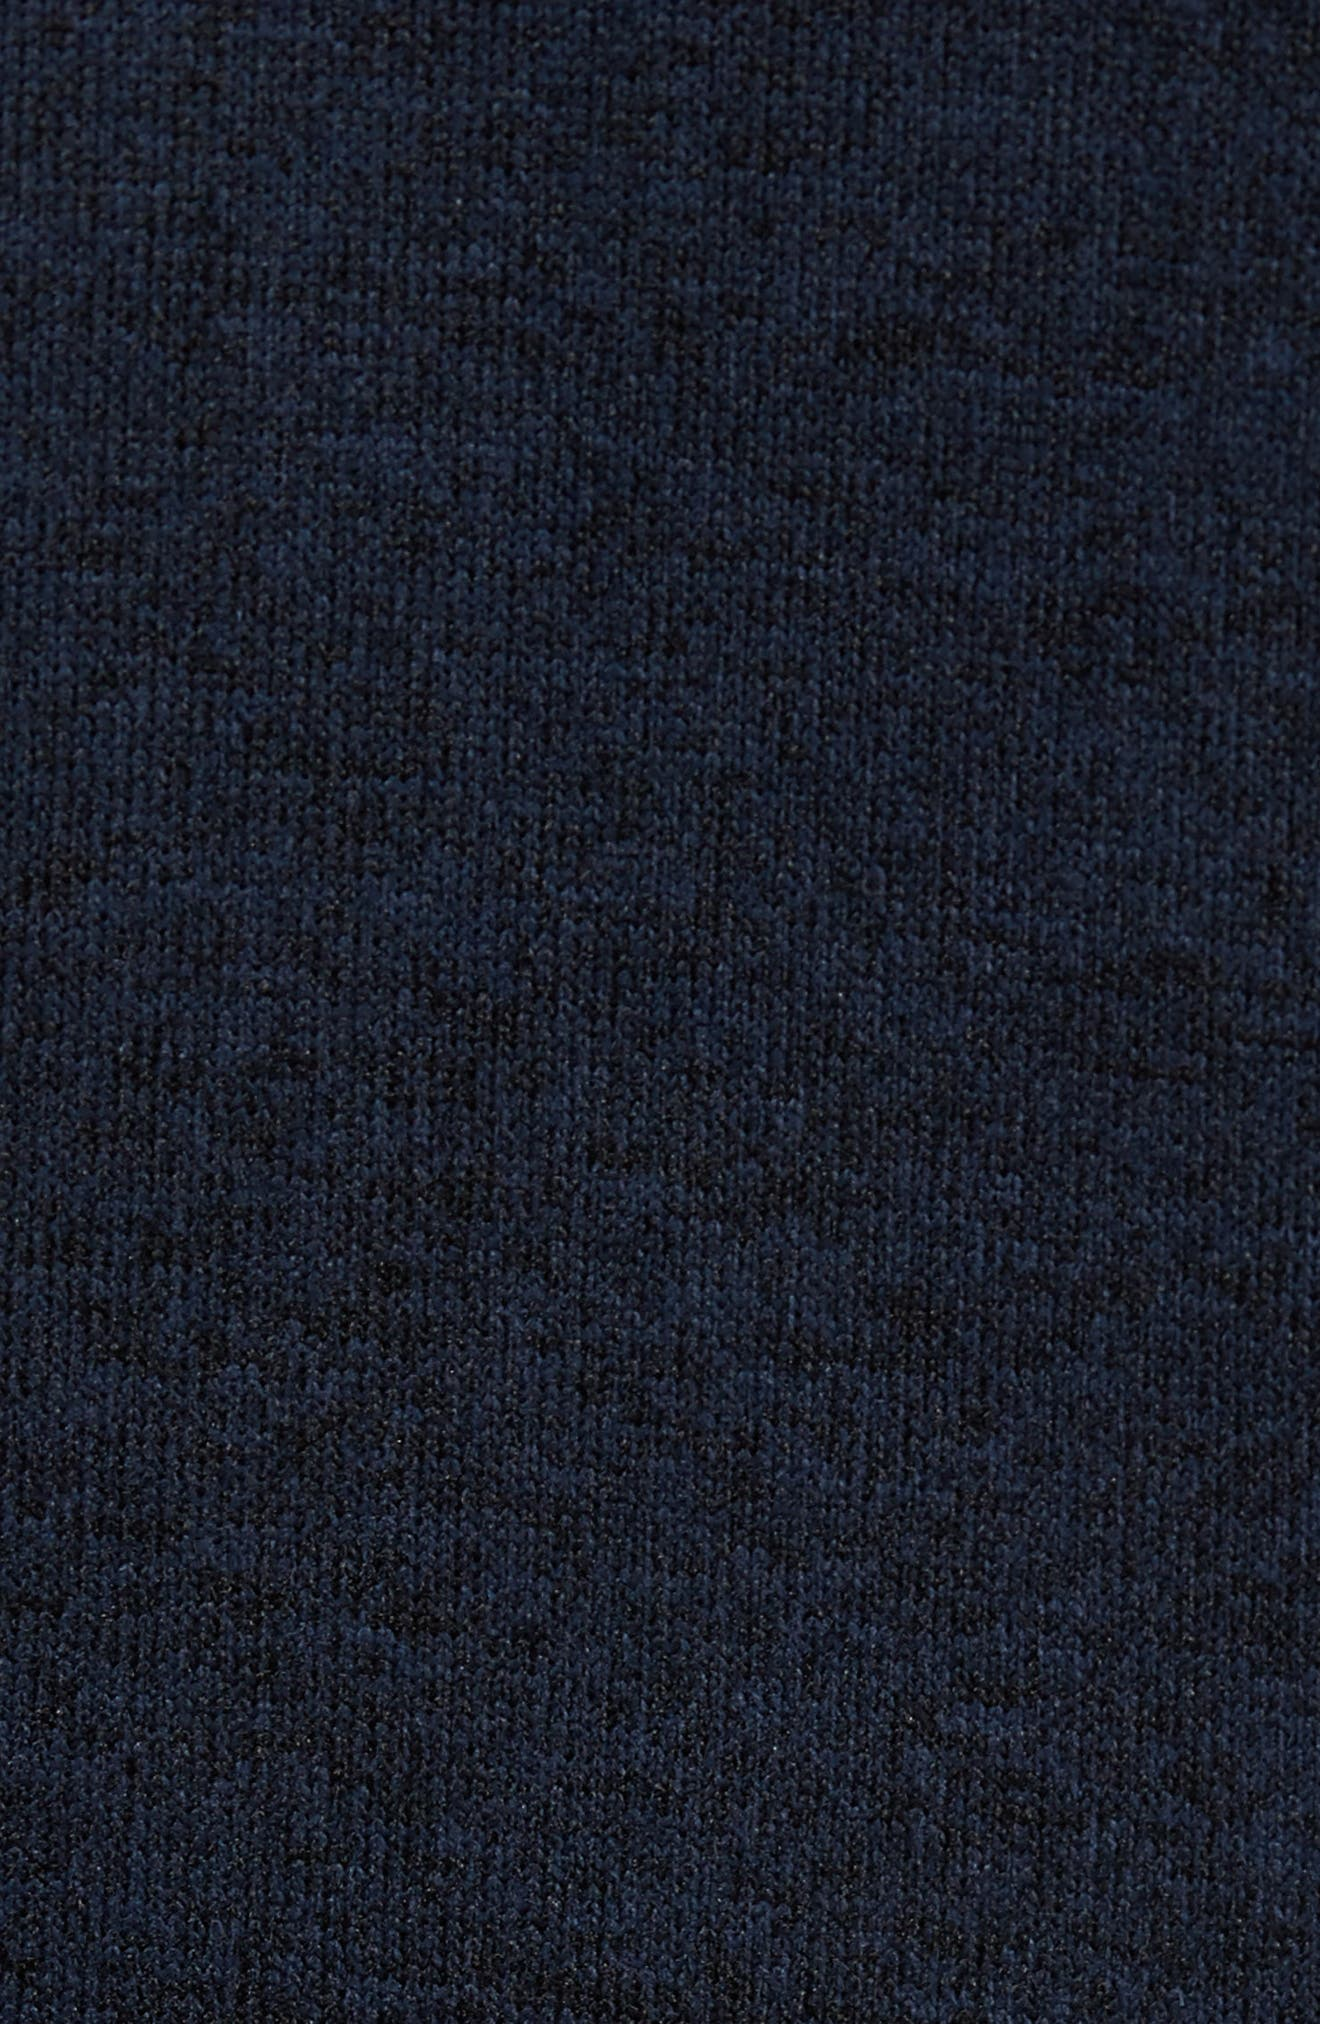 Sweater Knit Fleece Zip Front Jacket,                             Alternate thumbnail 15, color,